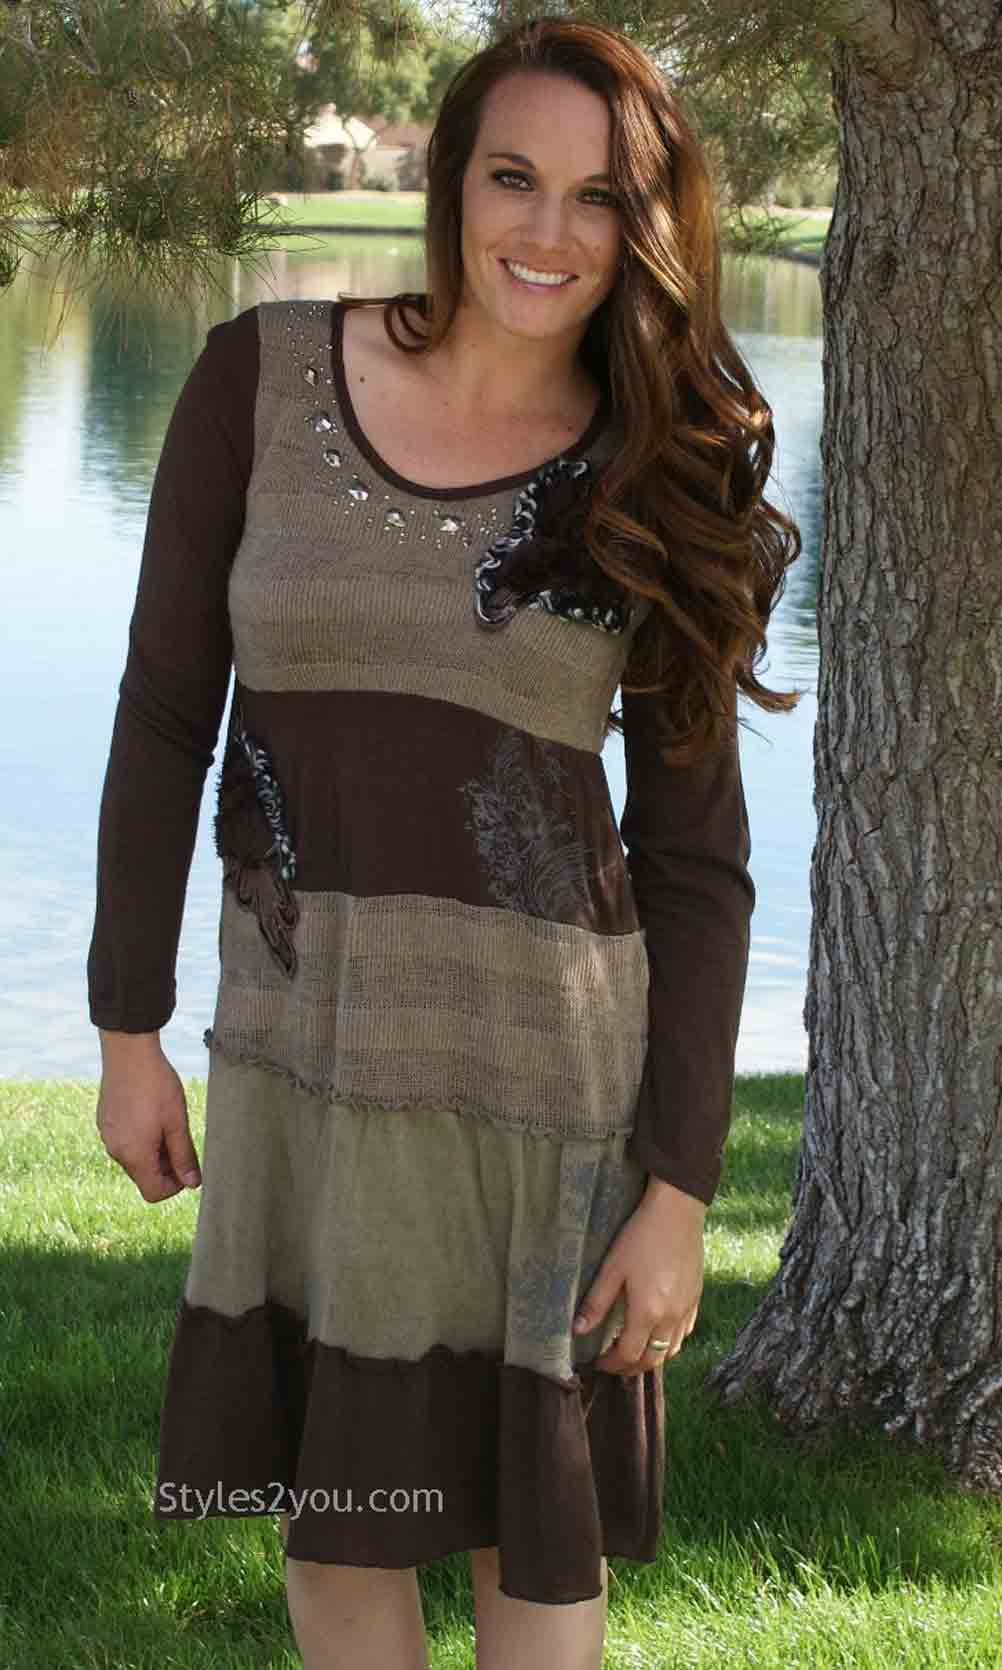 e93d014a2ee Aubrey Ladies Vintage Sweater Dress In Brown Pretty Angel Dress in ...